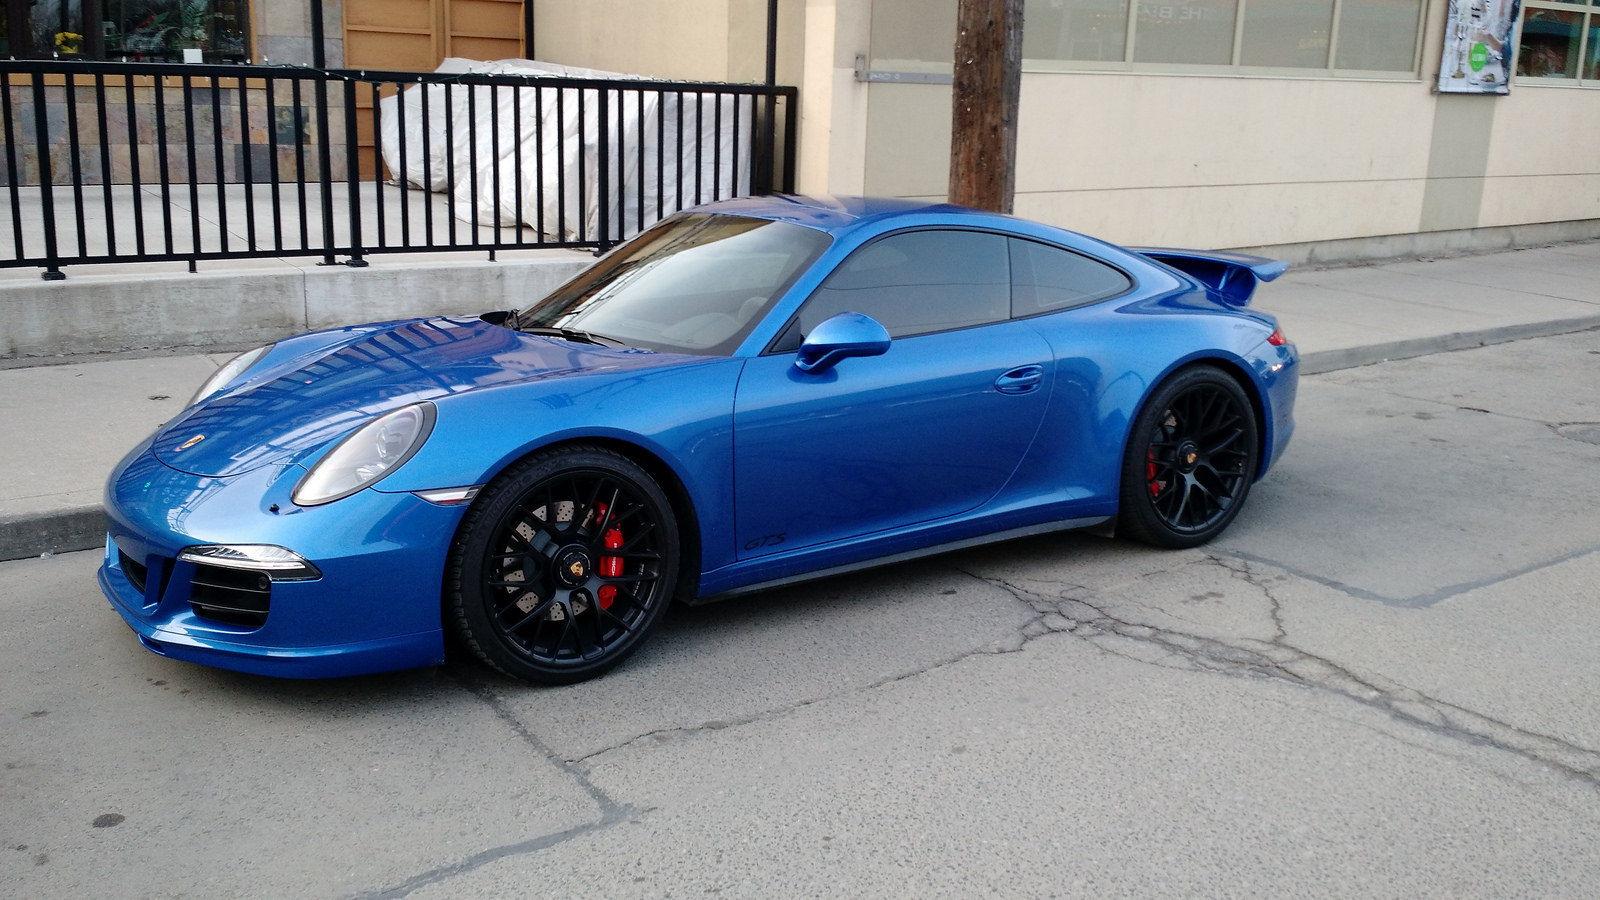 The End Of Sapphire Blue Metallic Page 2 Rennlist Porsche Discussion Forums